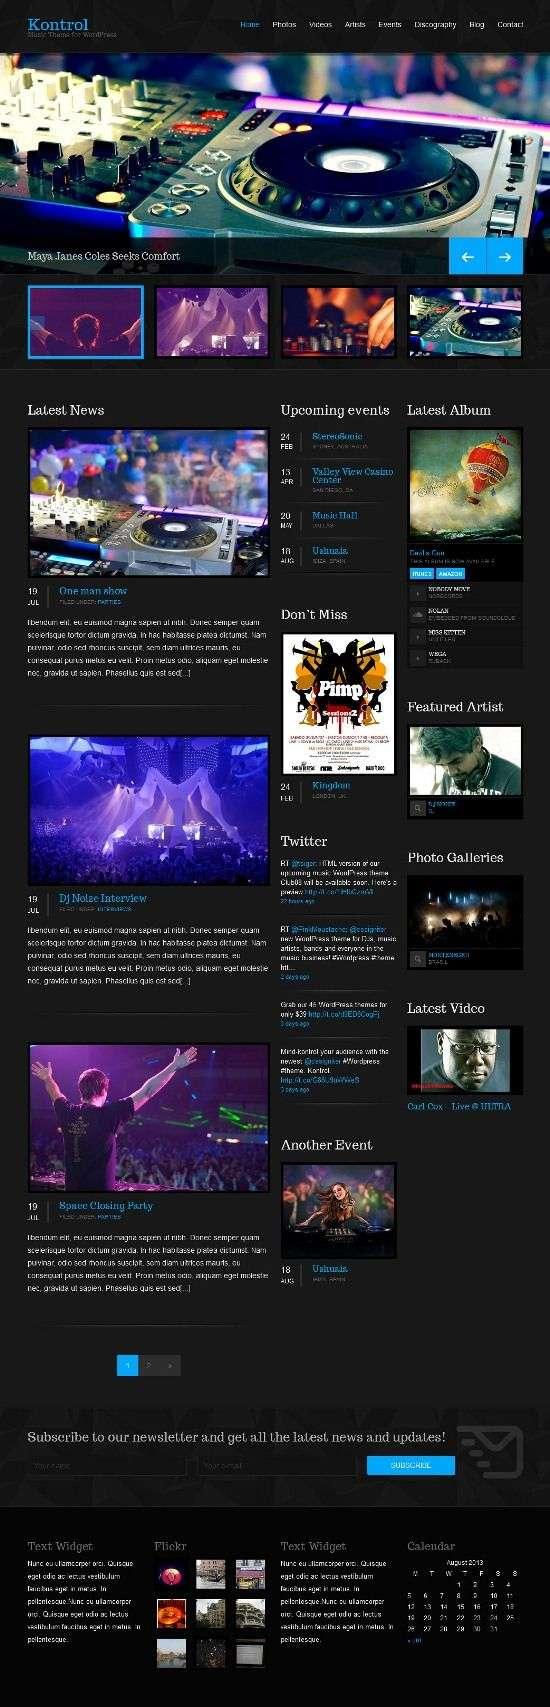 kontrol cssigniter avjthemescom 01 - Kontrol WordPress Theme